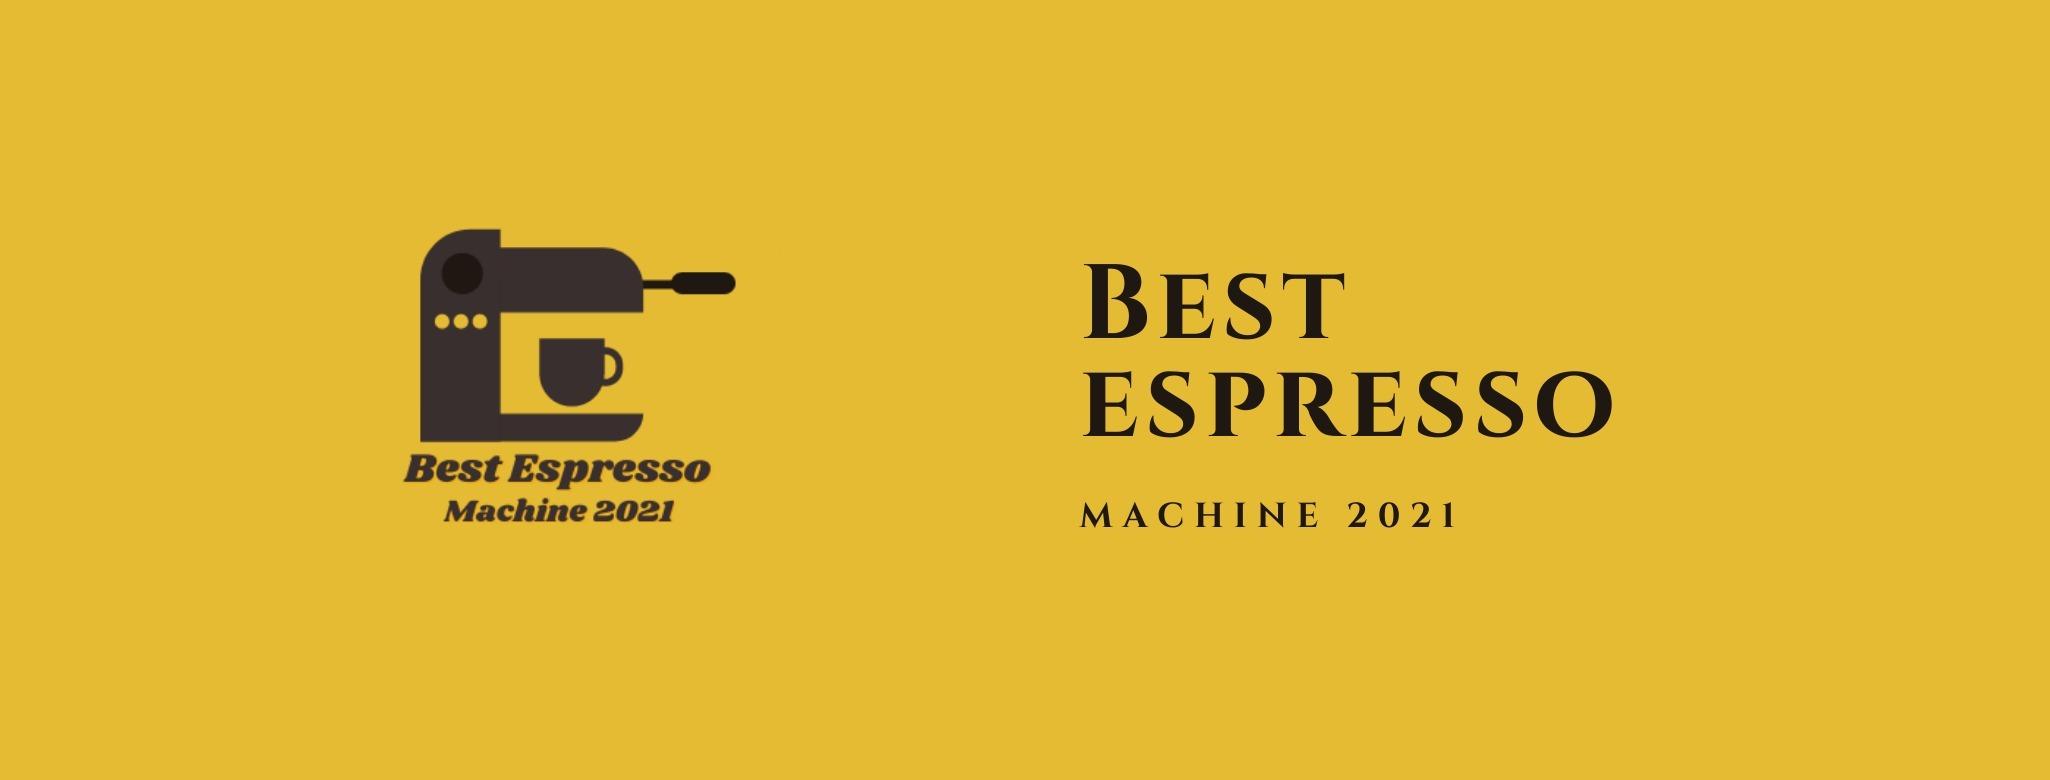 Best Espresso Machine 2021 (@bestespresso2021) Cover Image